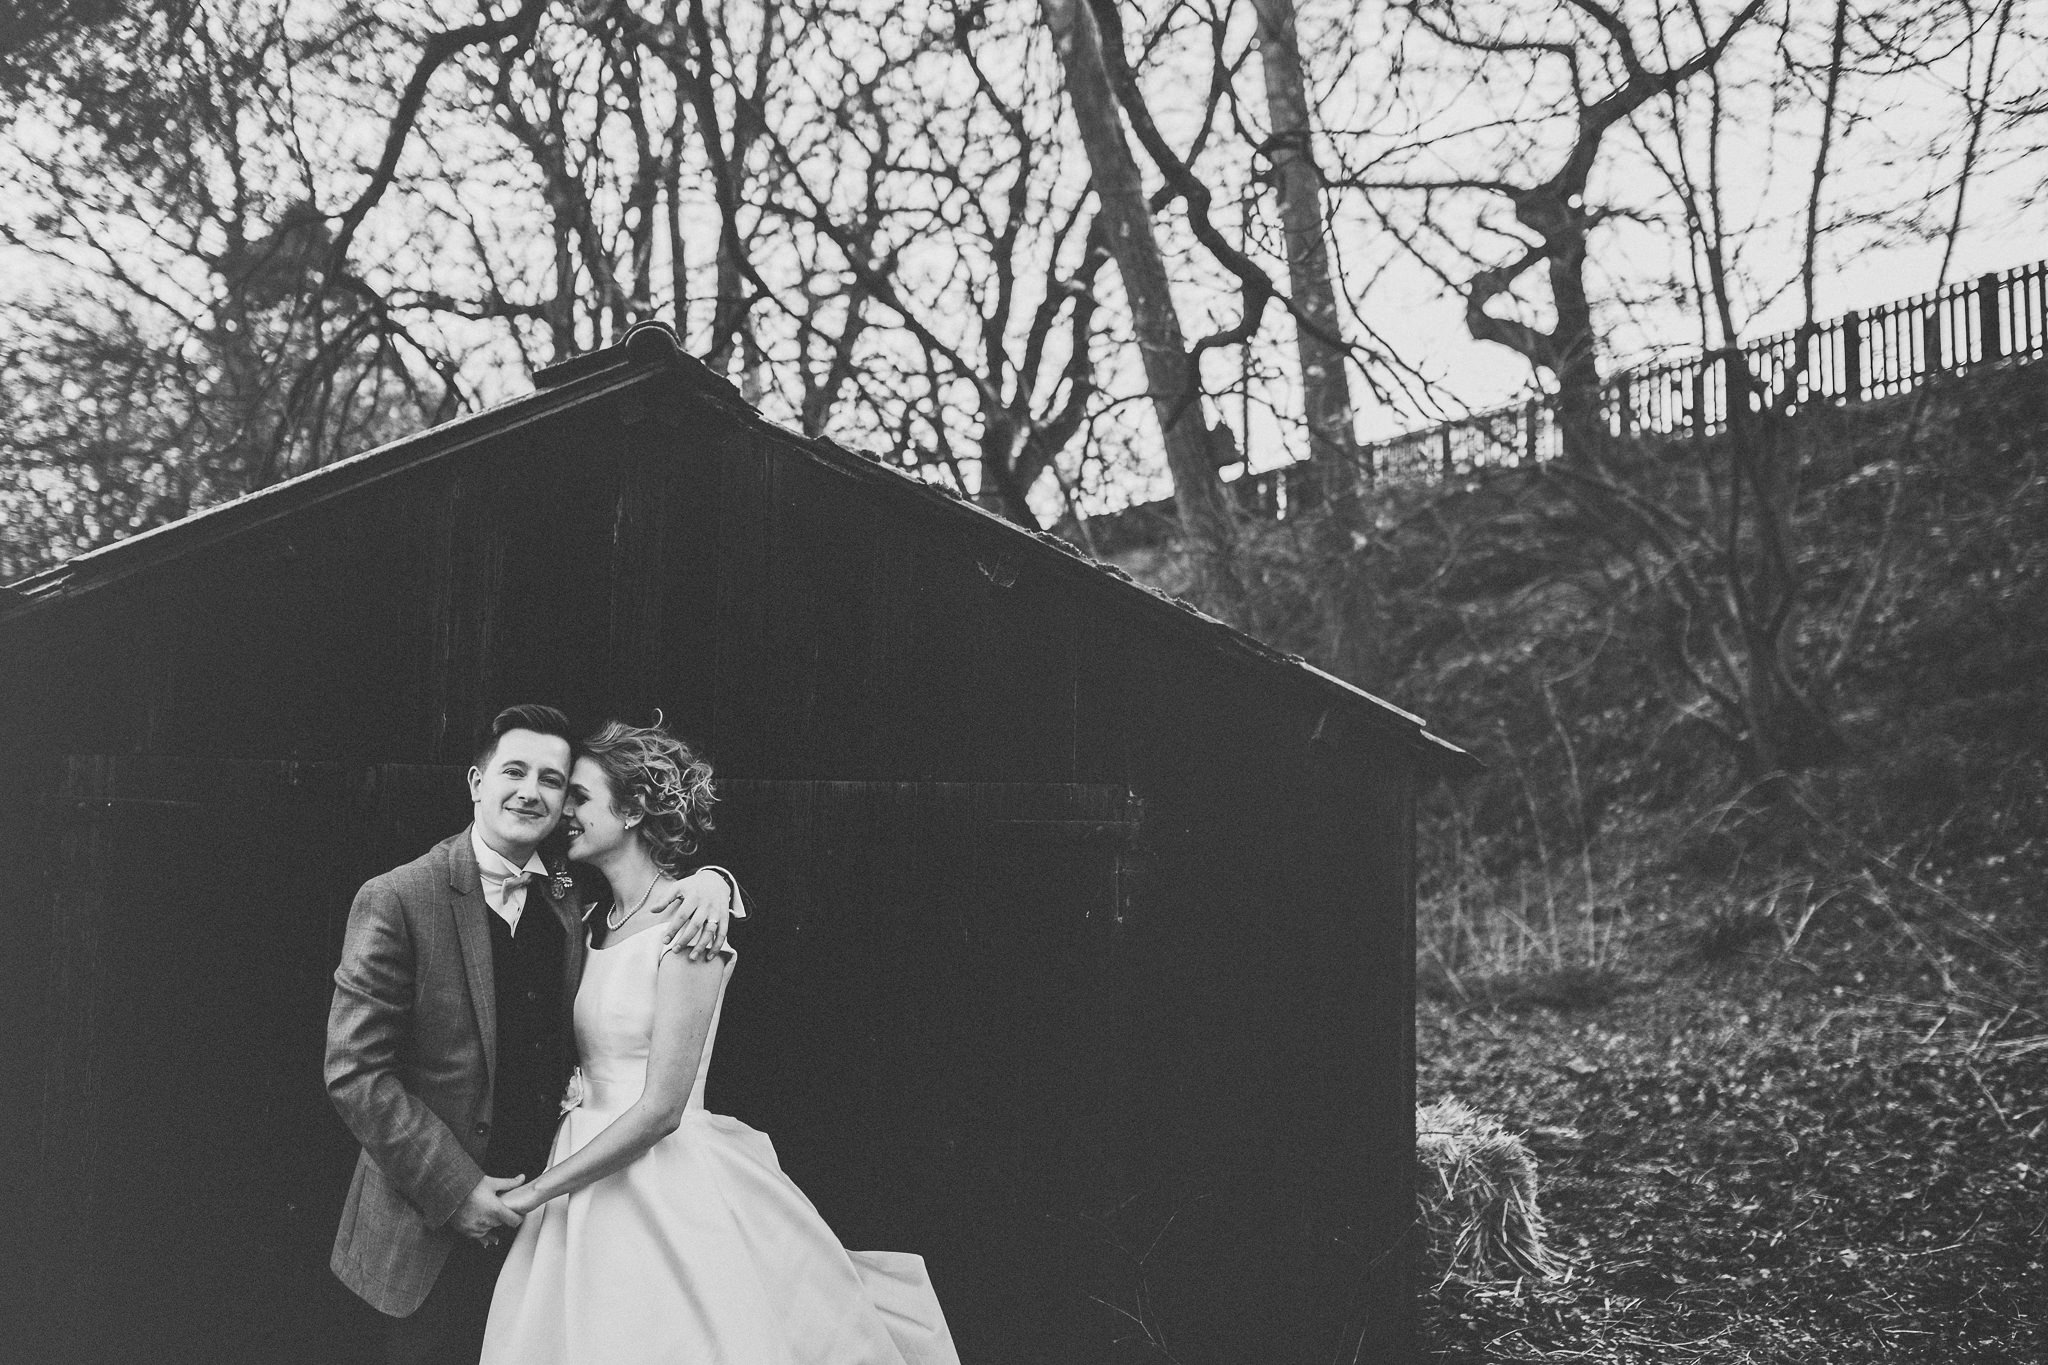 Lancashire-Creative-natural-documentary-wedding-photography-90080